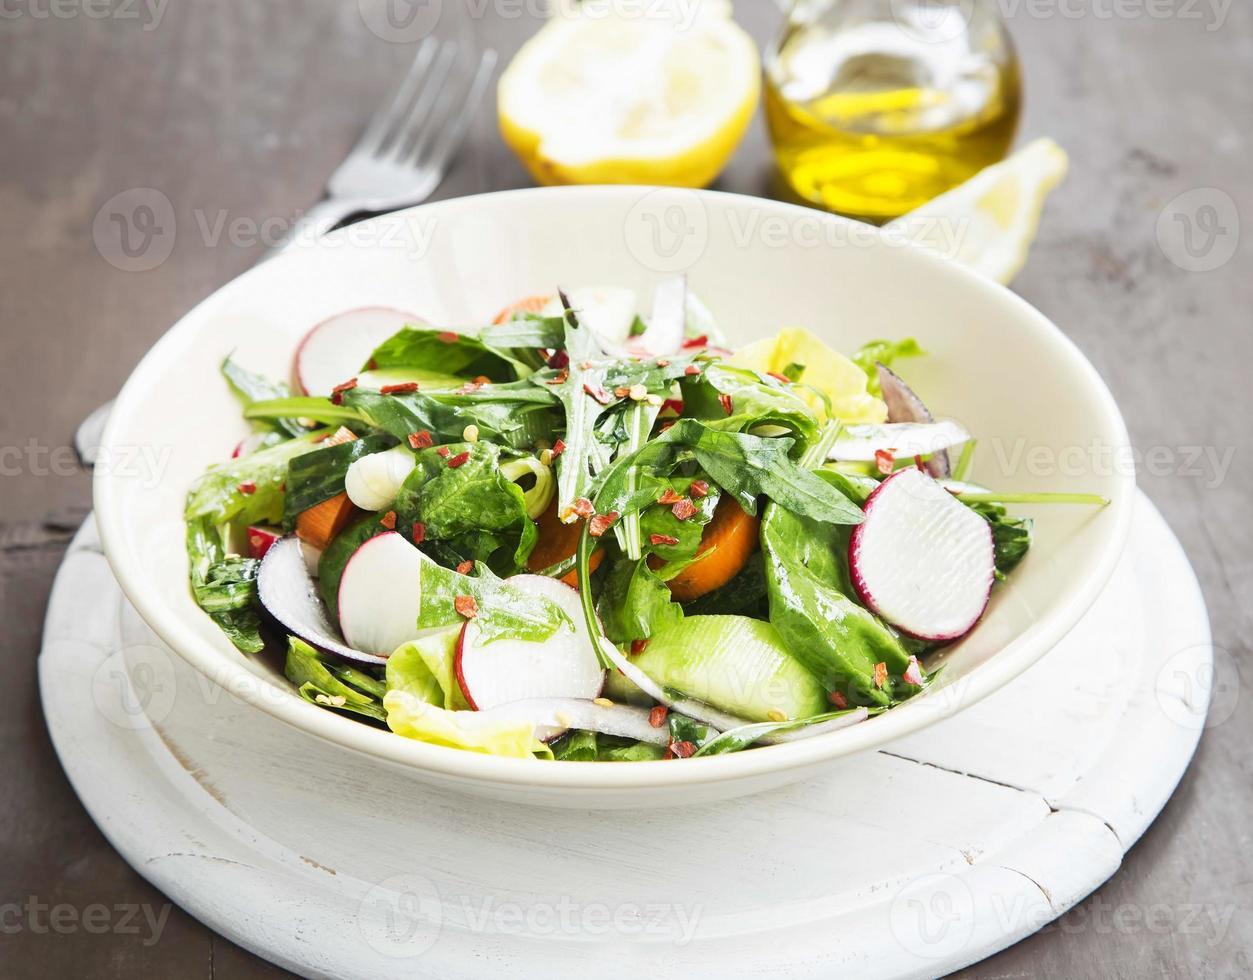 Vegetables Salad Dish with Fresh Organic Lettuce,Radish, Carrots photo